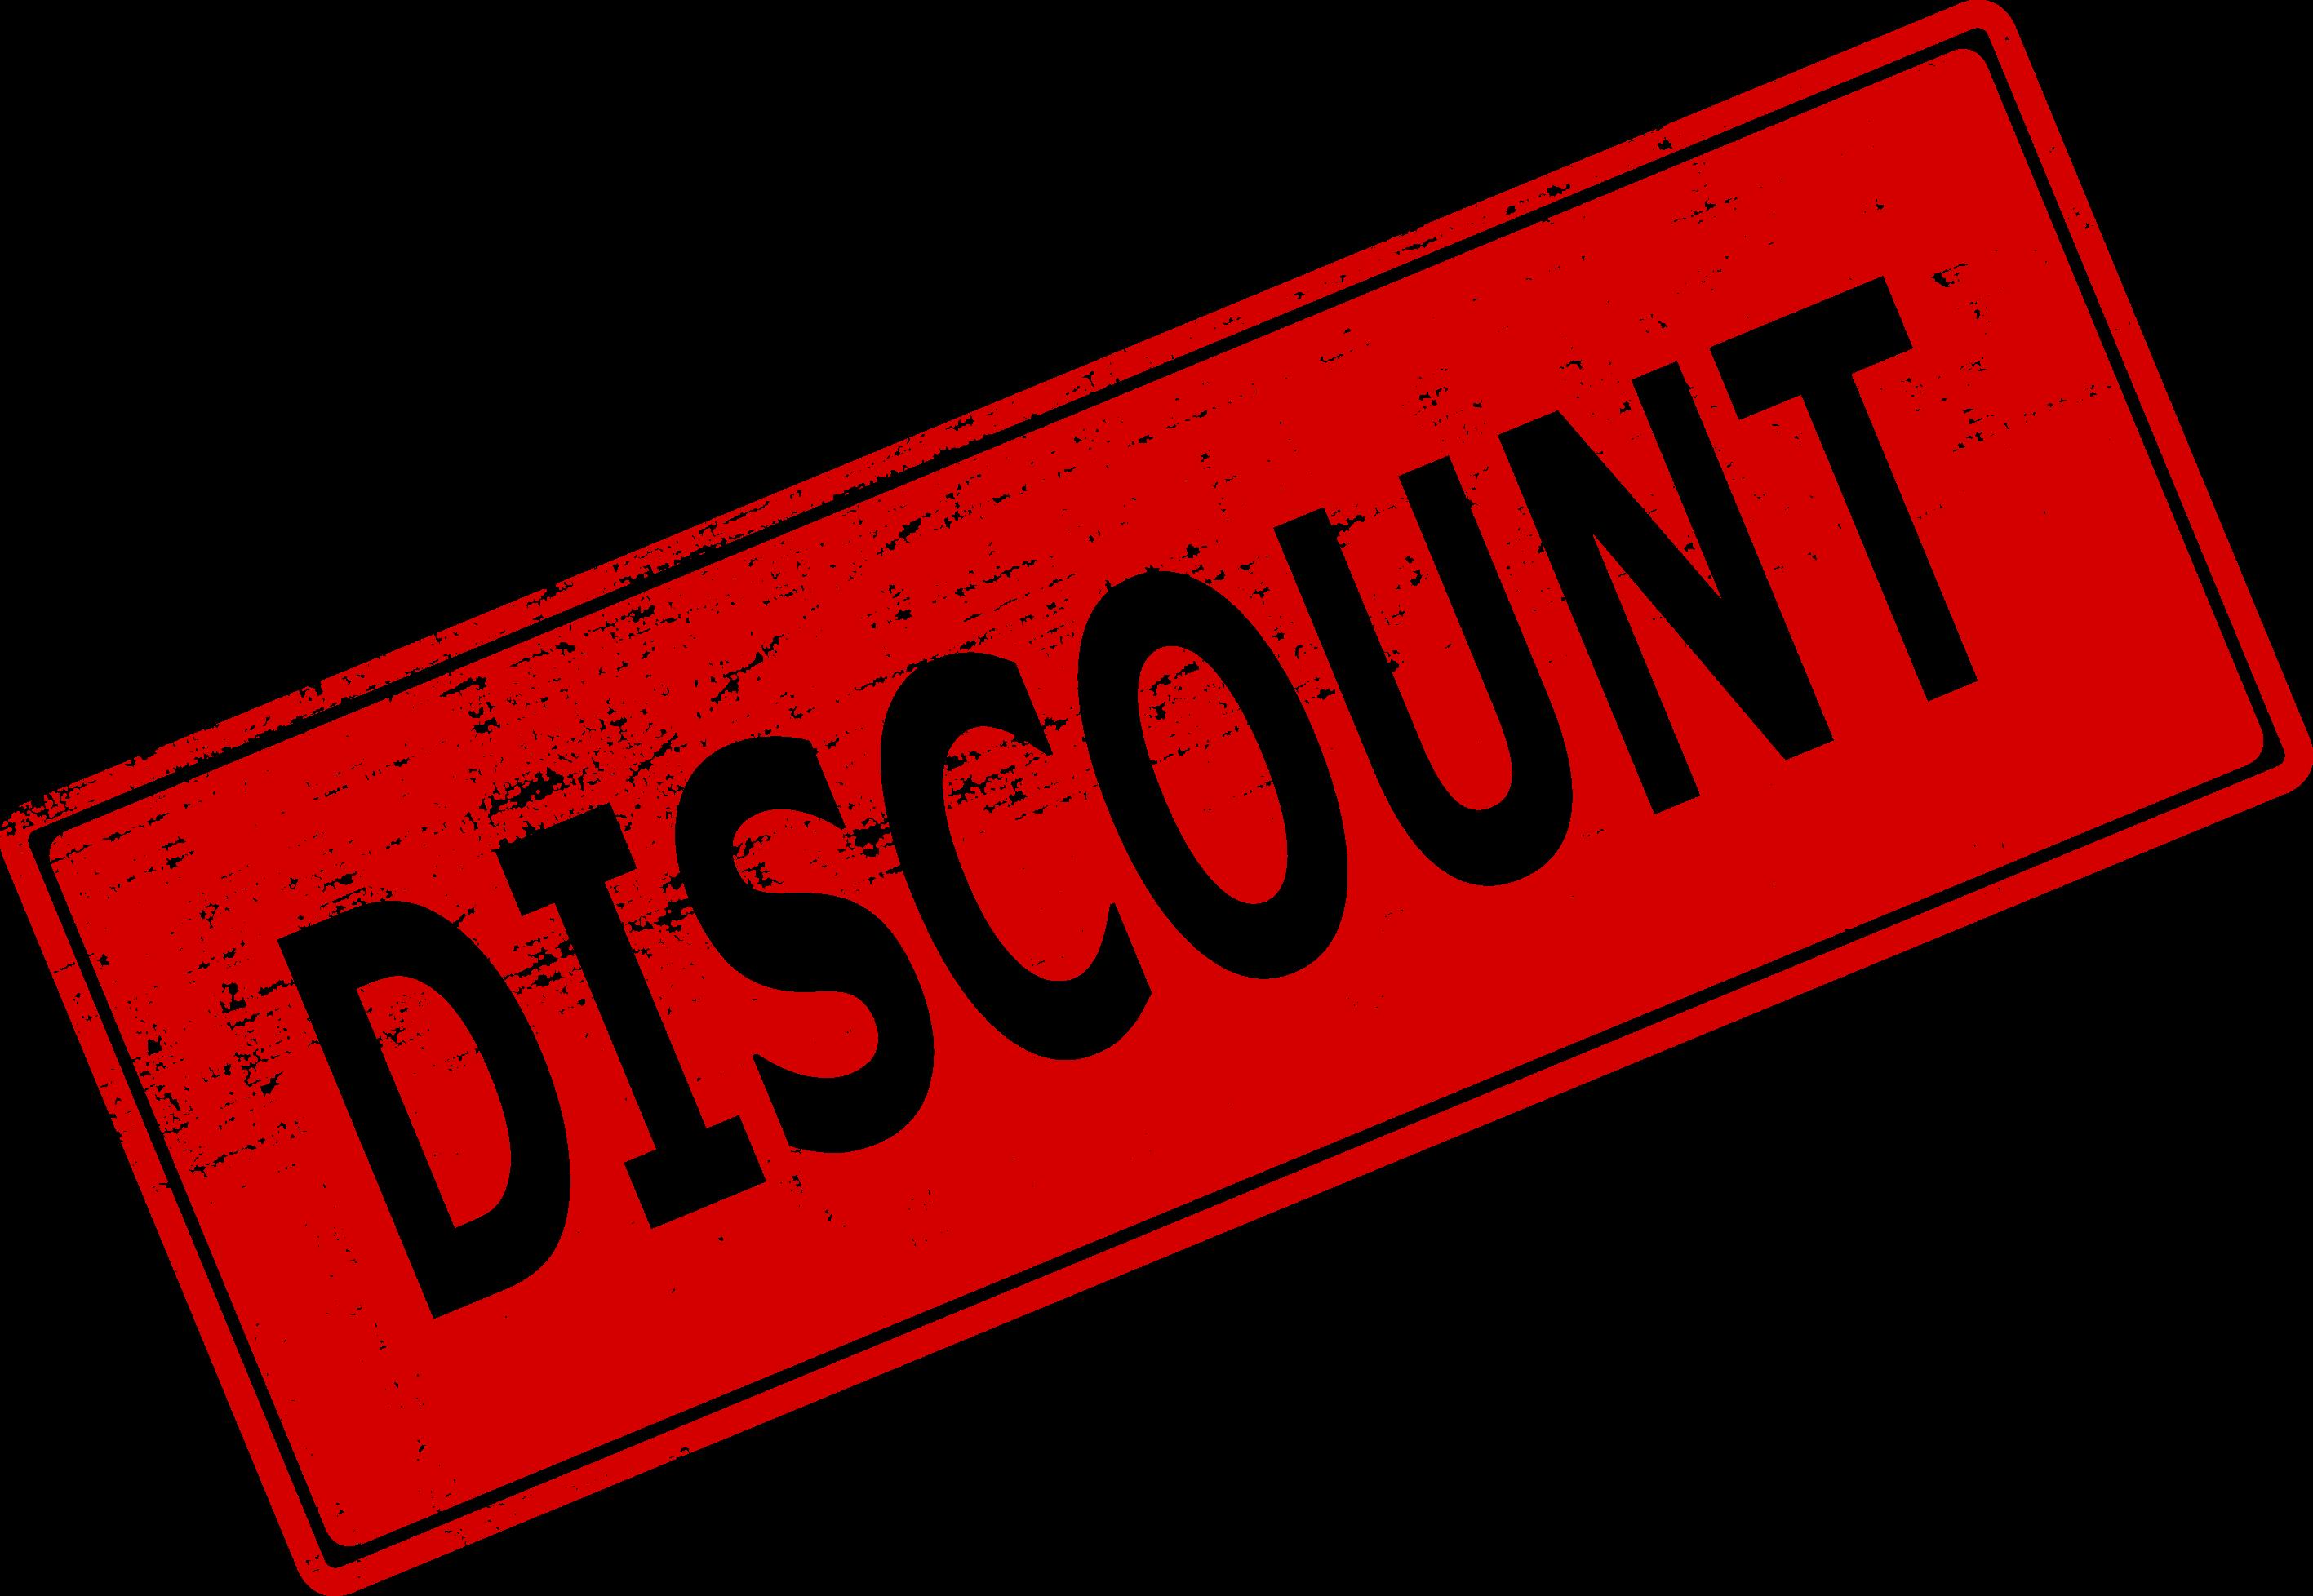 4 Discount Stamp (PNG Transparent) | OnlyGFX.com